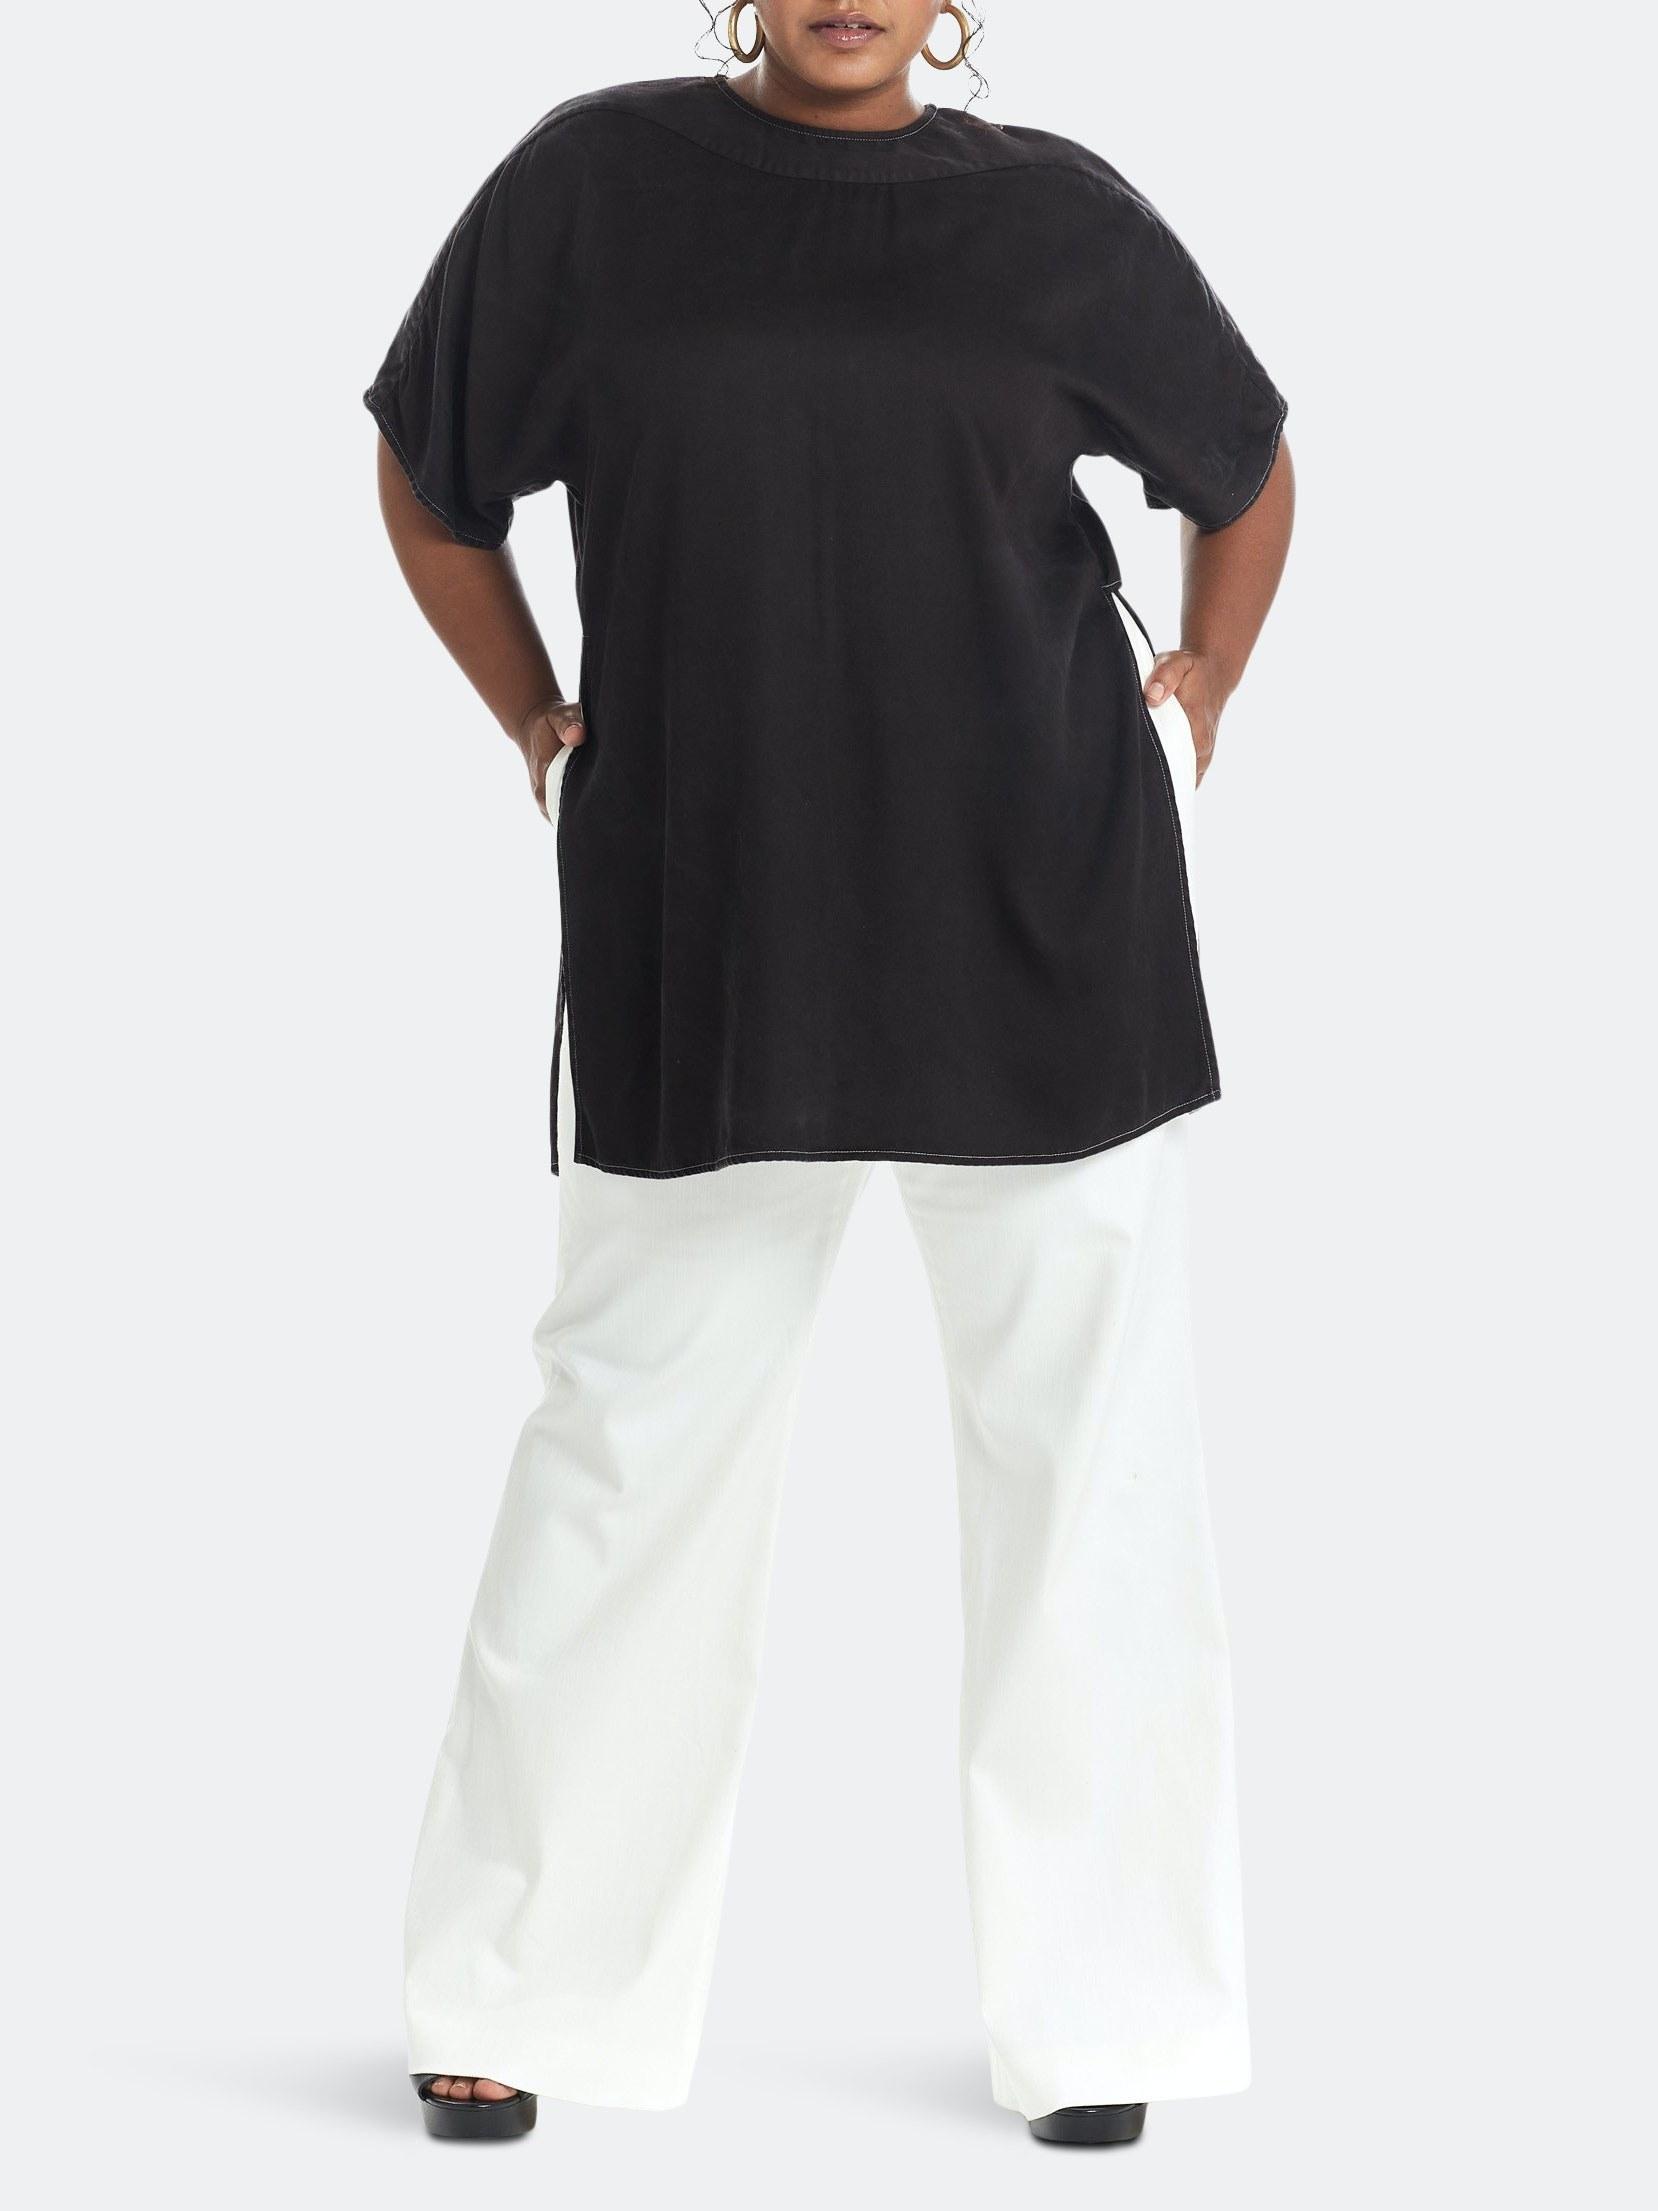 model wearing a black tunic